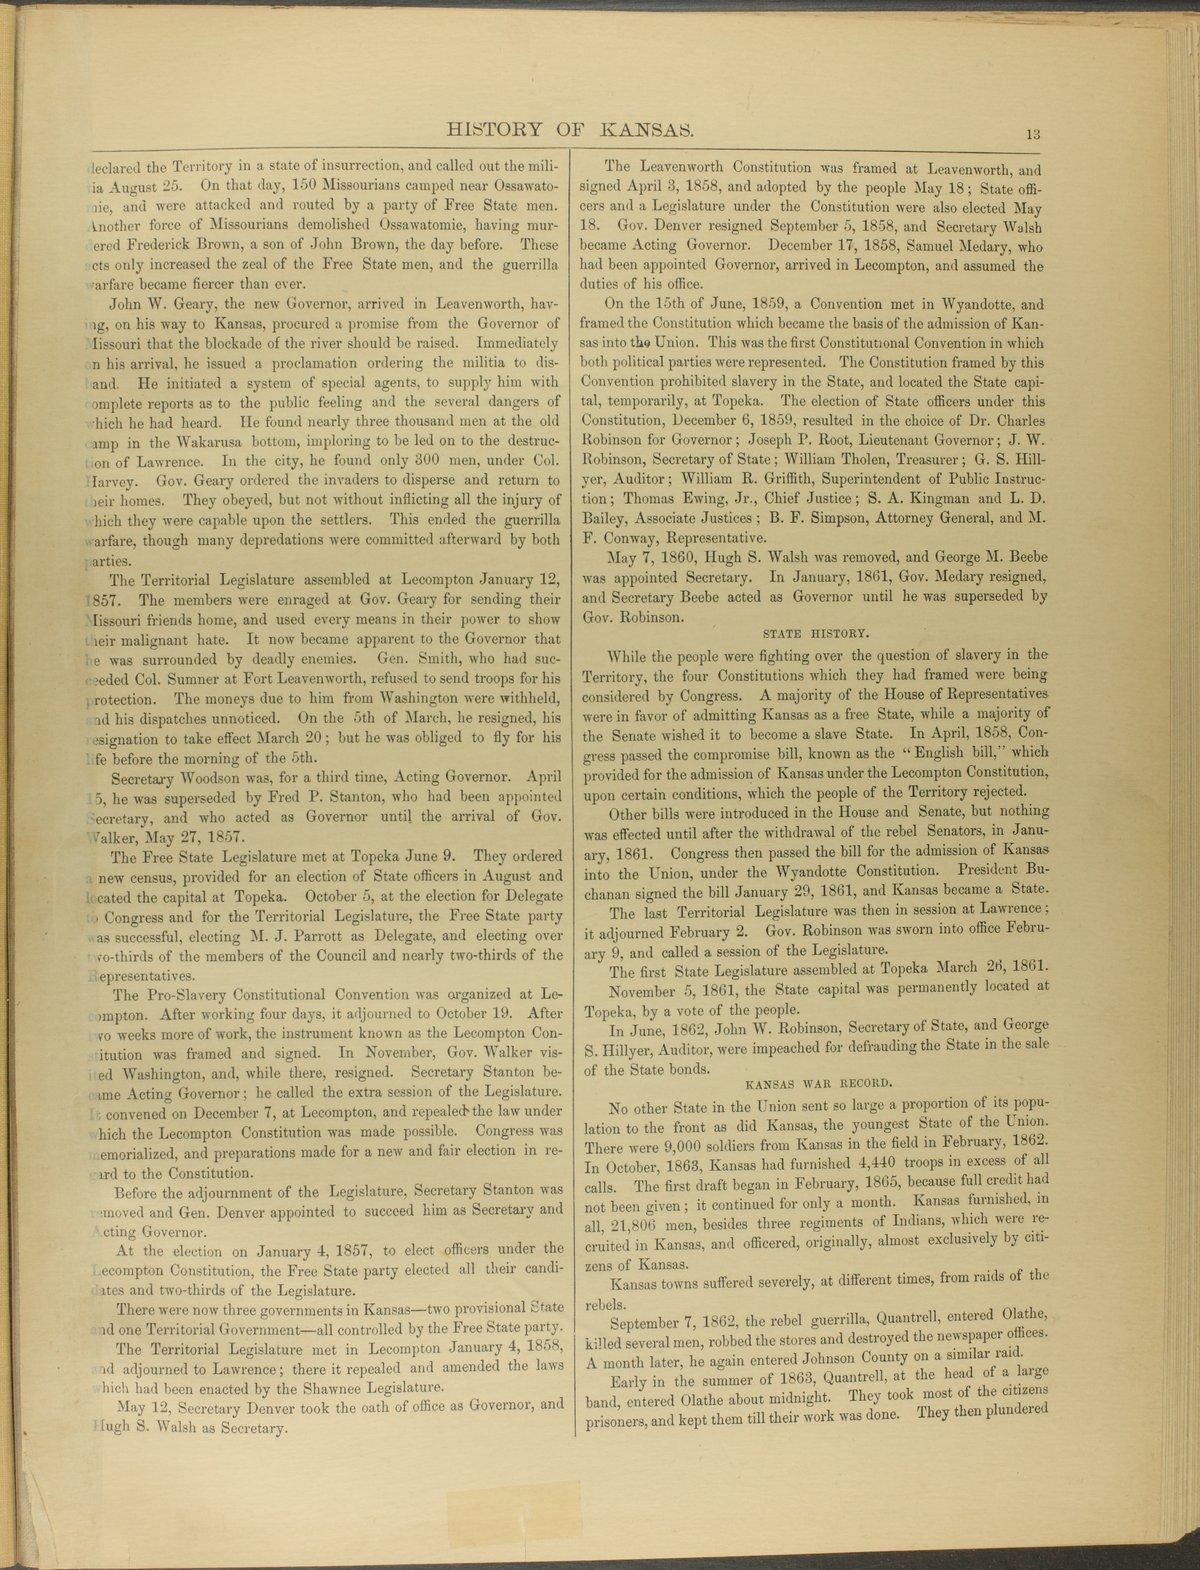 Historical plat book of Riley County, Kansas - 13